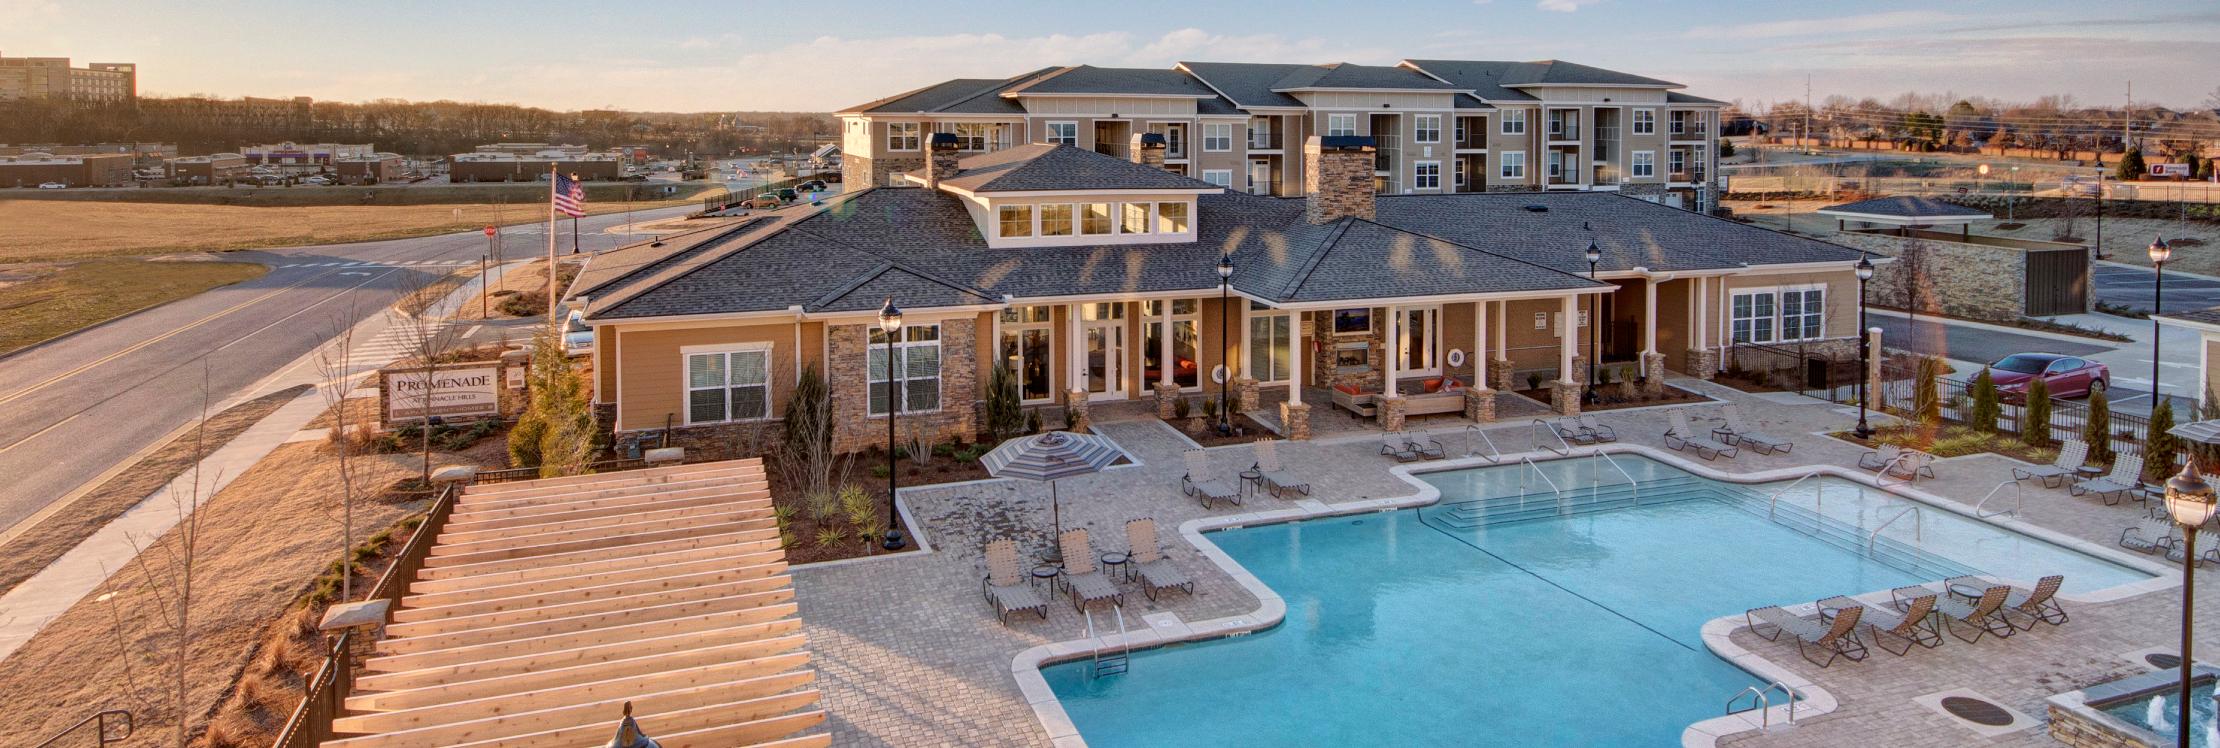 The Promenade Apartments at Pinnacle Hills Reviews, Ratings   Apartments near 4101 W Huntington Road , Rogers AR